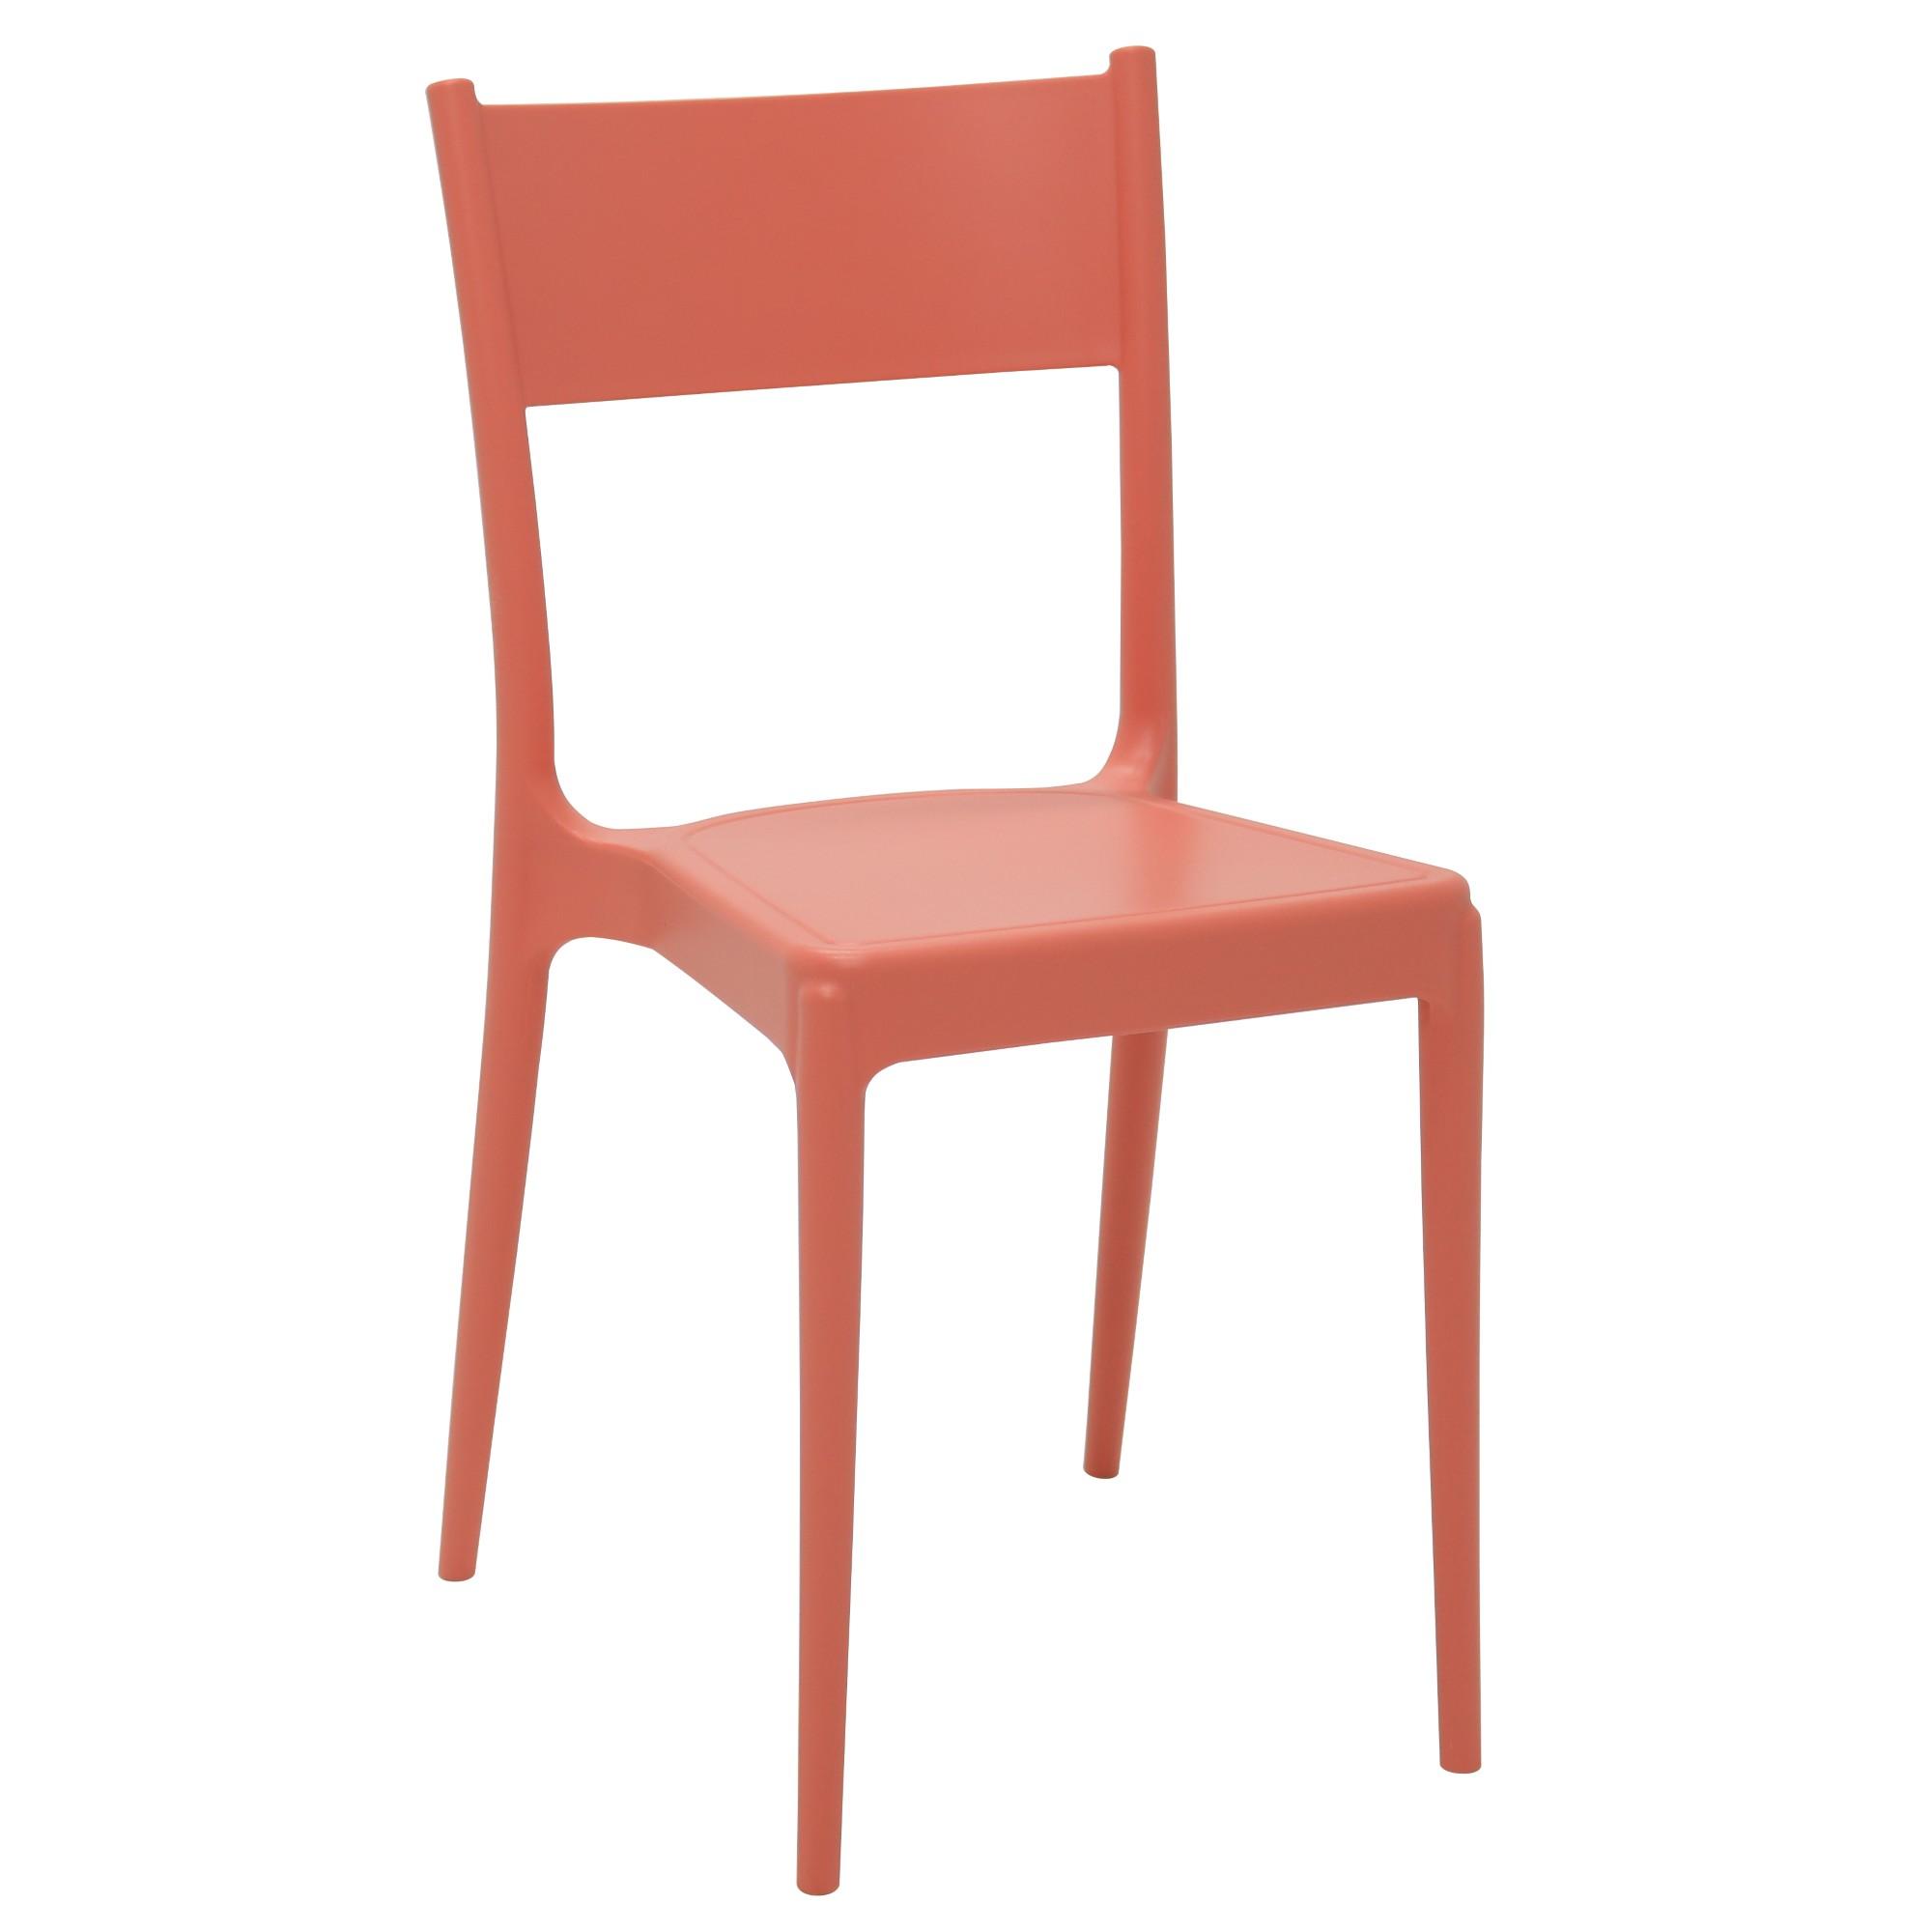 Cadeira Tramontina Diana em Polipropileno Coral